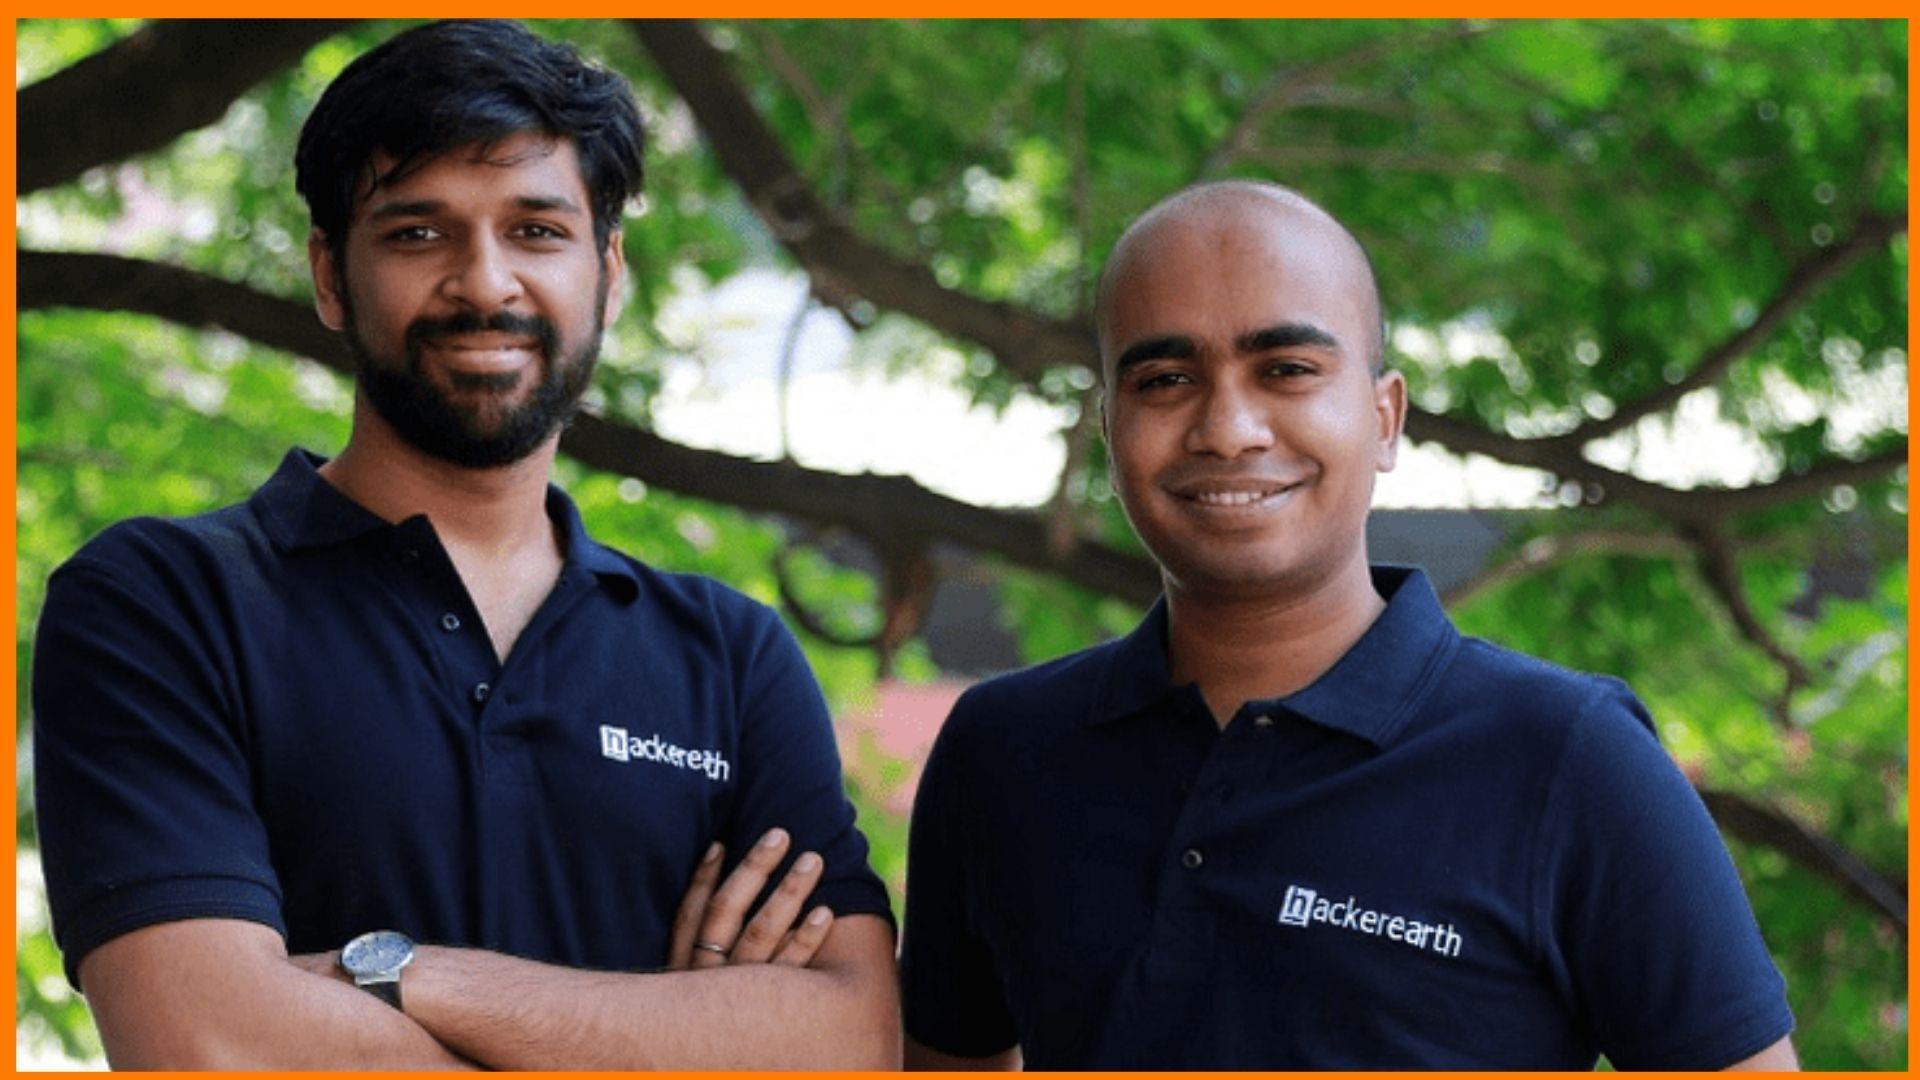 Sachin Gupta and Vivek Prakash are founders of HackerEarth